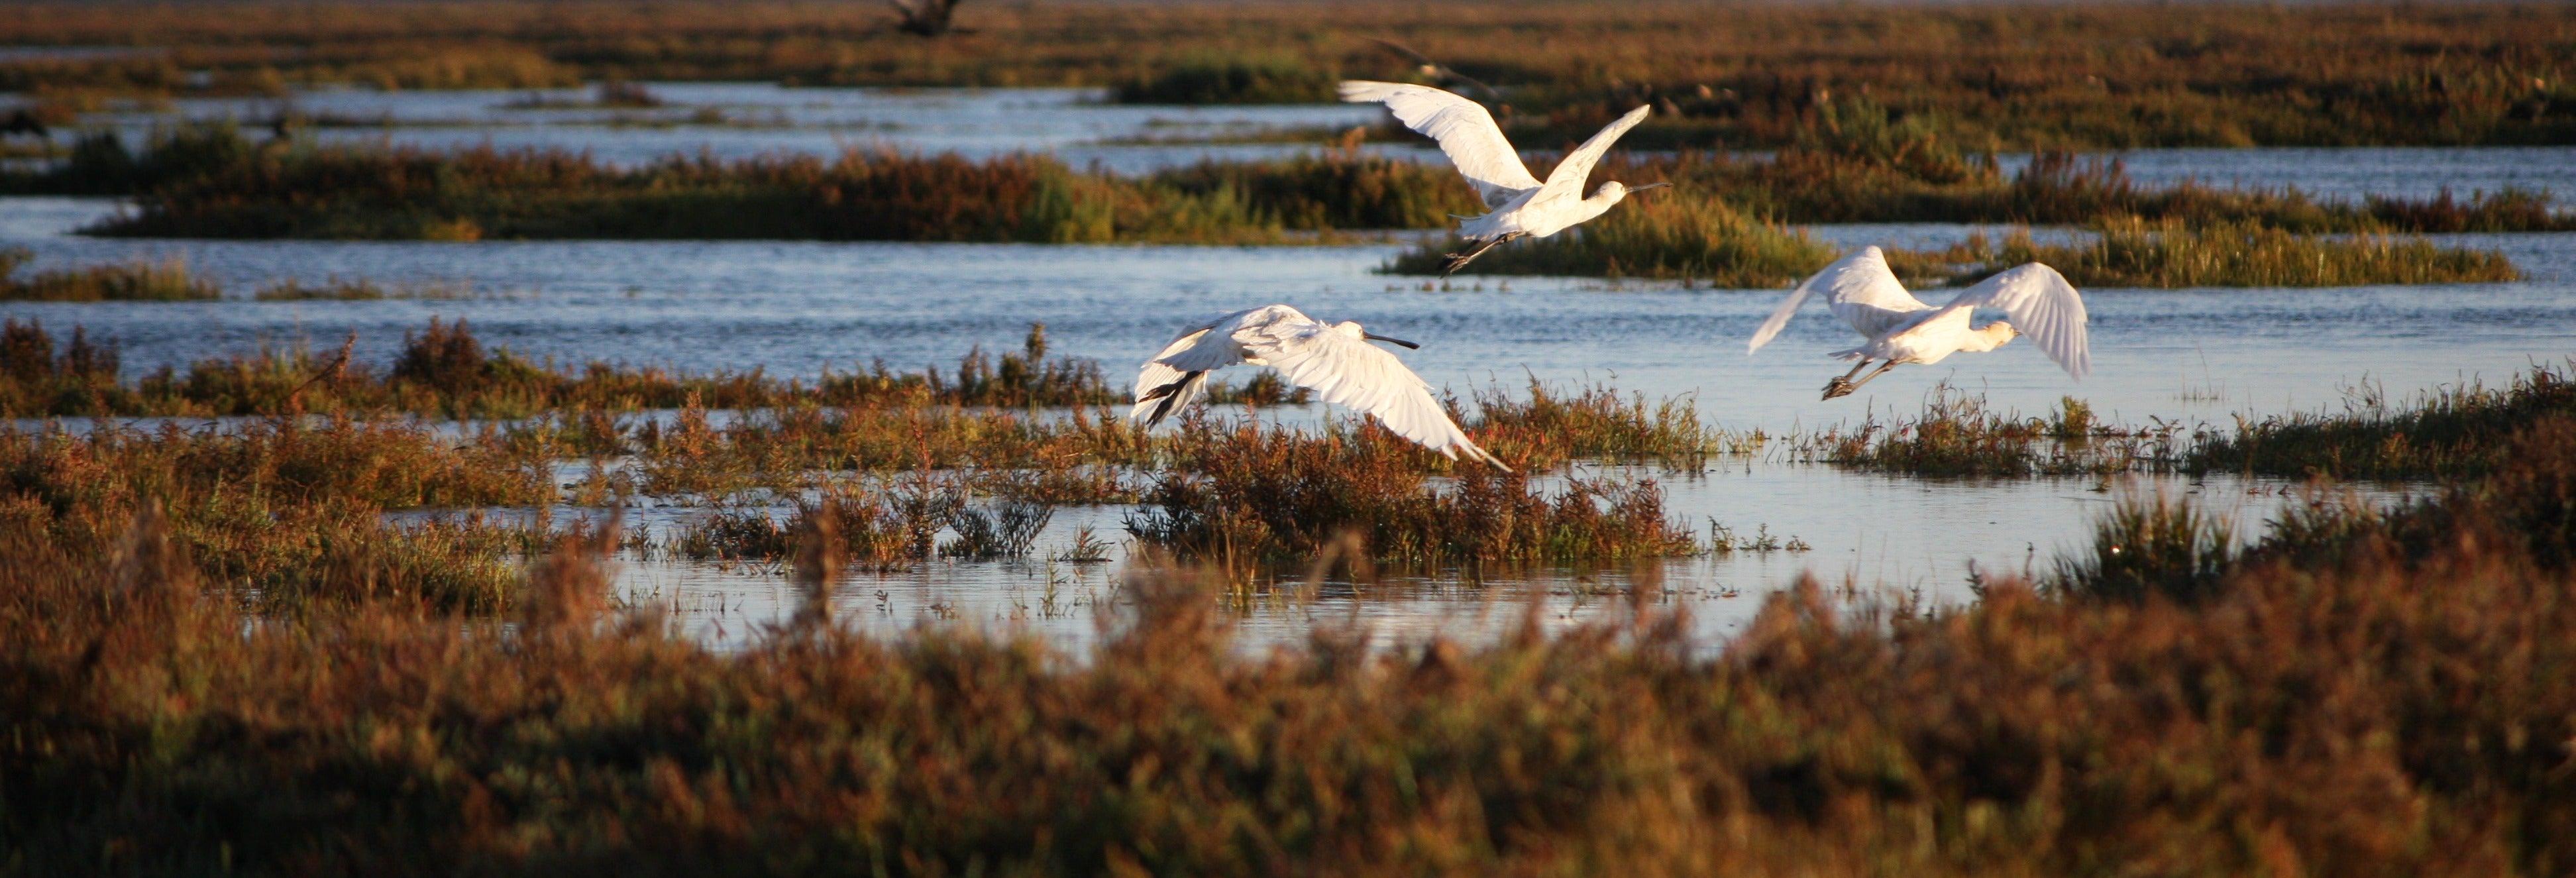 Birdwatching on Ria Formosa